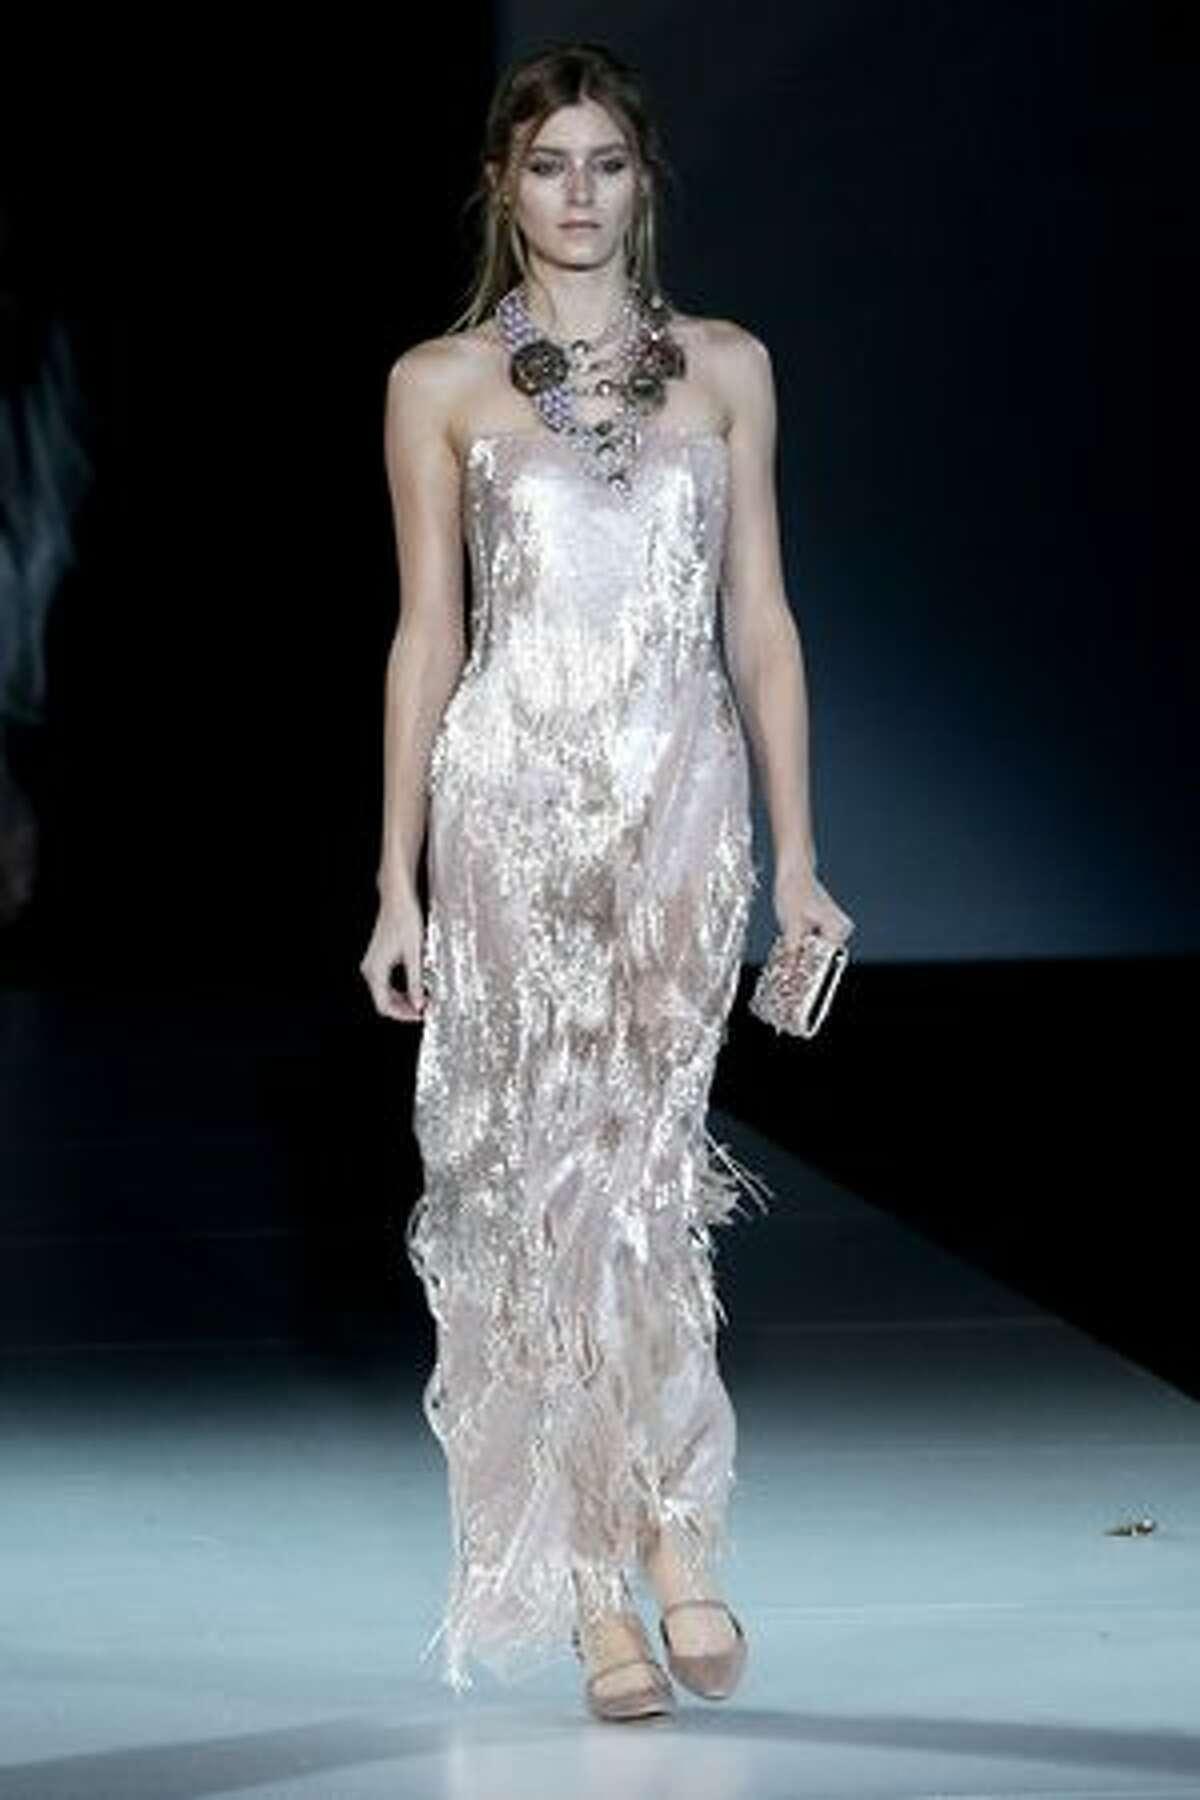 A model walks the runway during Giorgio Armani show as part of Milan Fashion Week Womenswear Autumn/Winter 2011 in Milan, Italy.